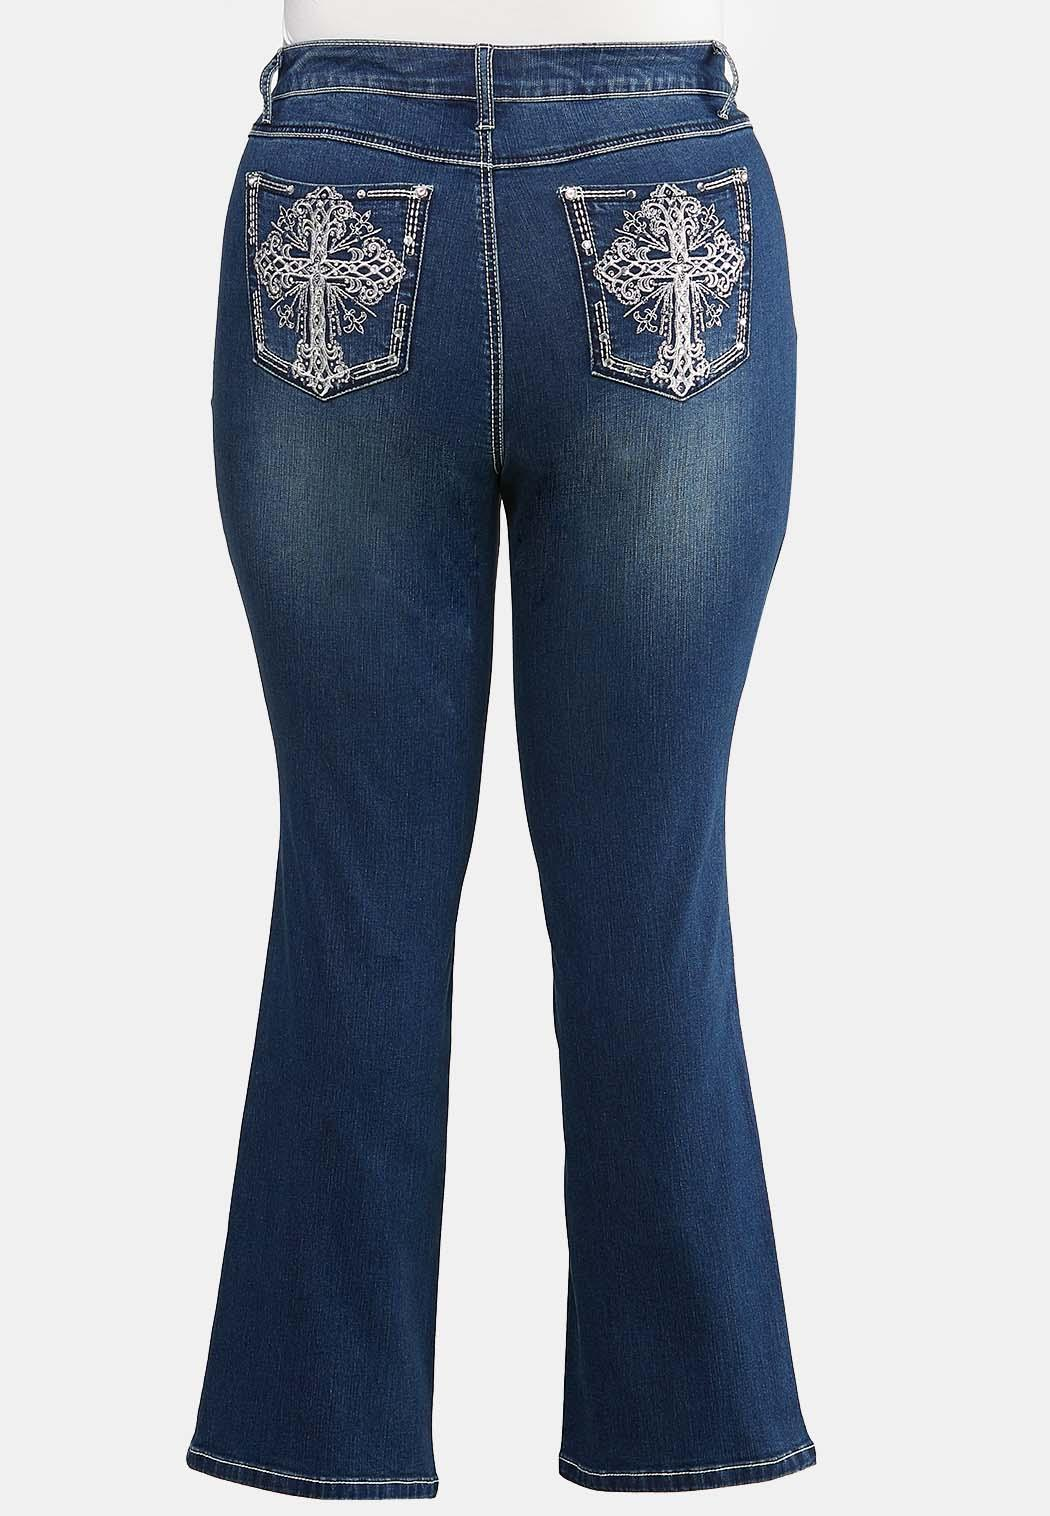 Plus Size Bling Cross Pocket Jeans